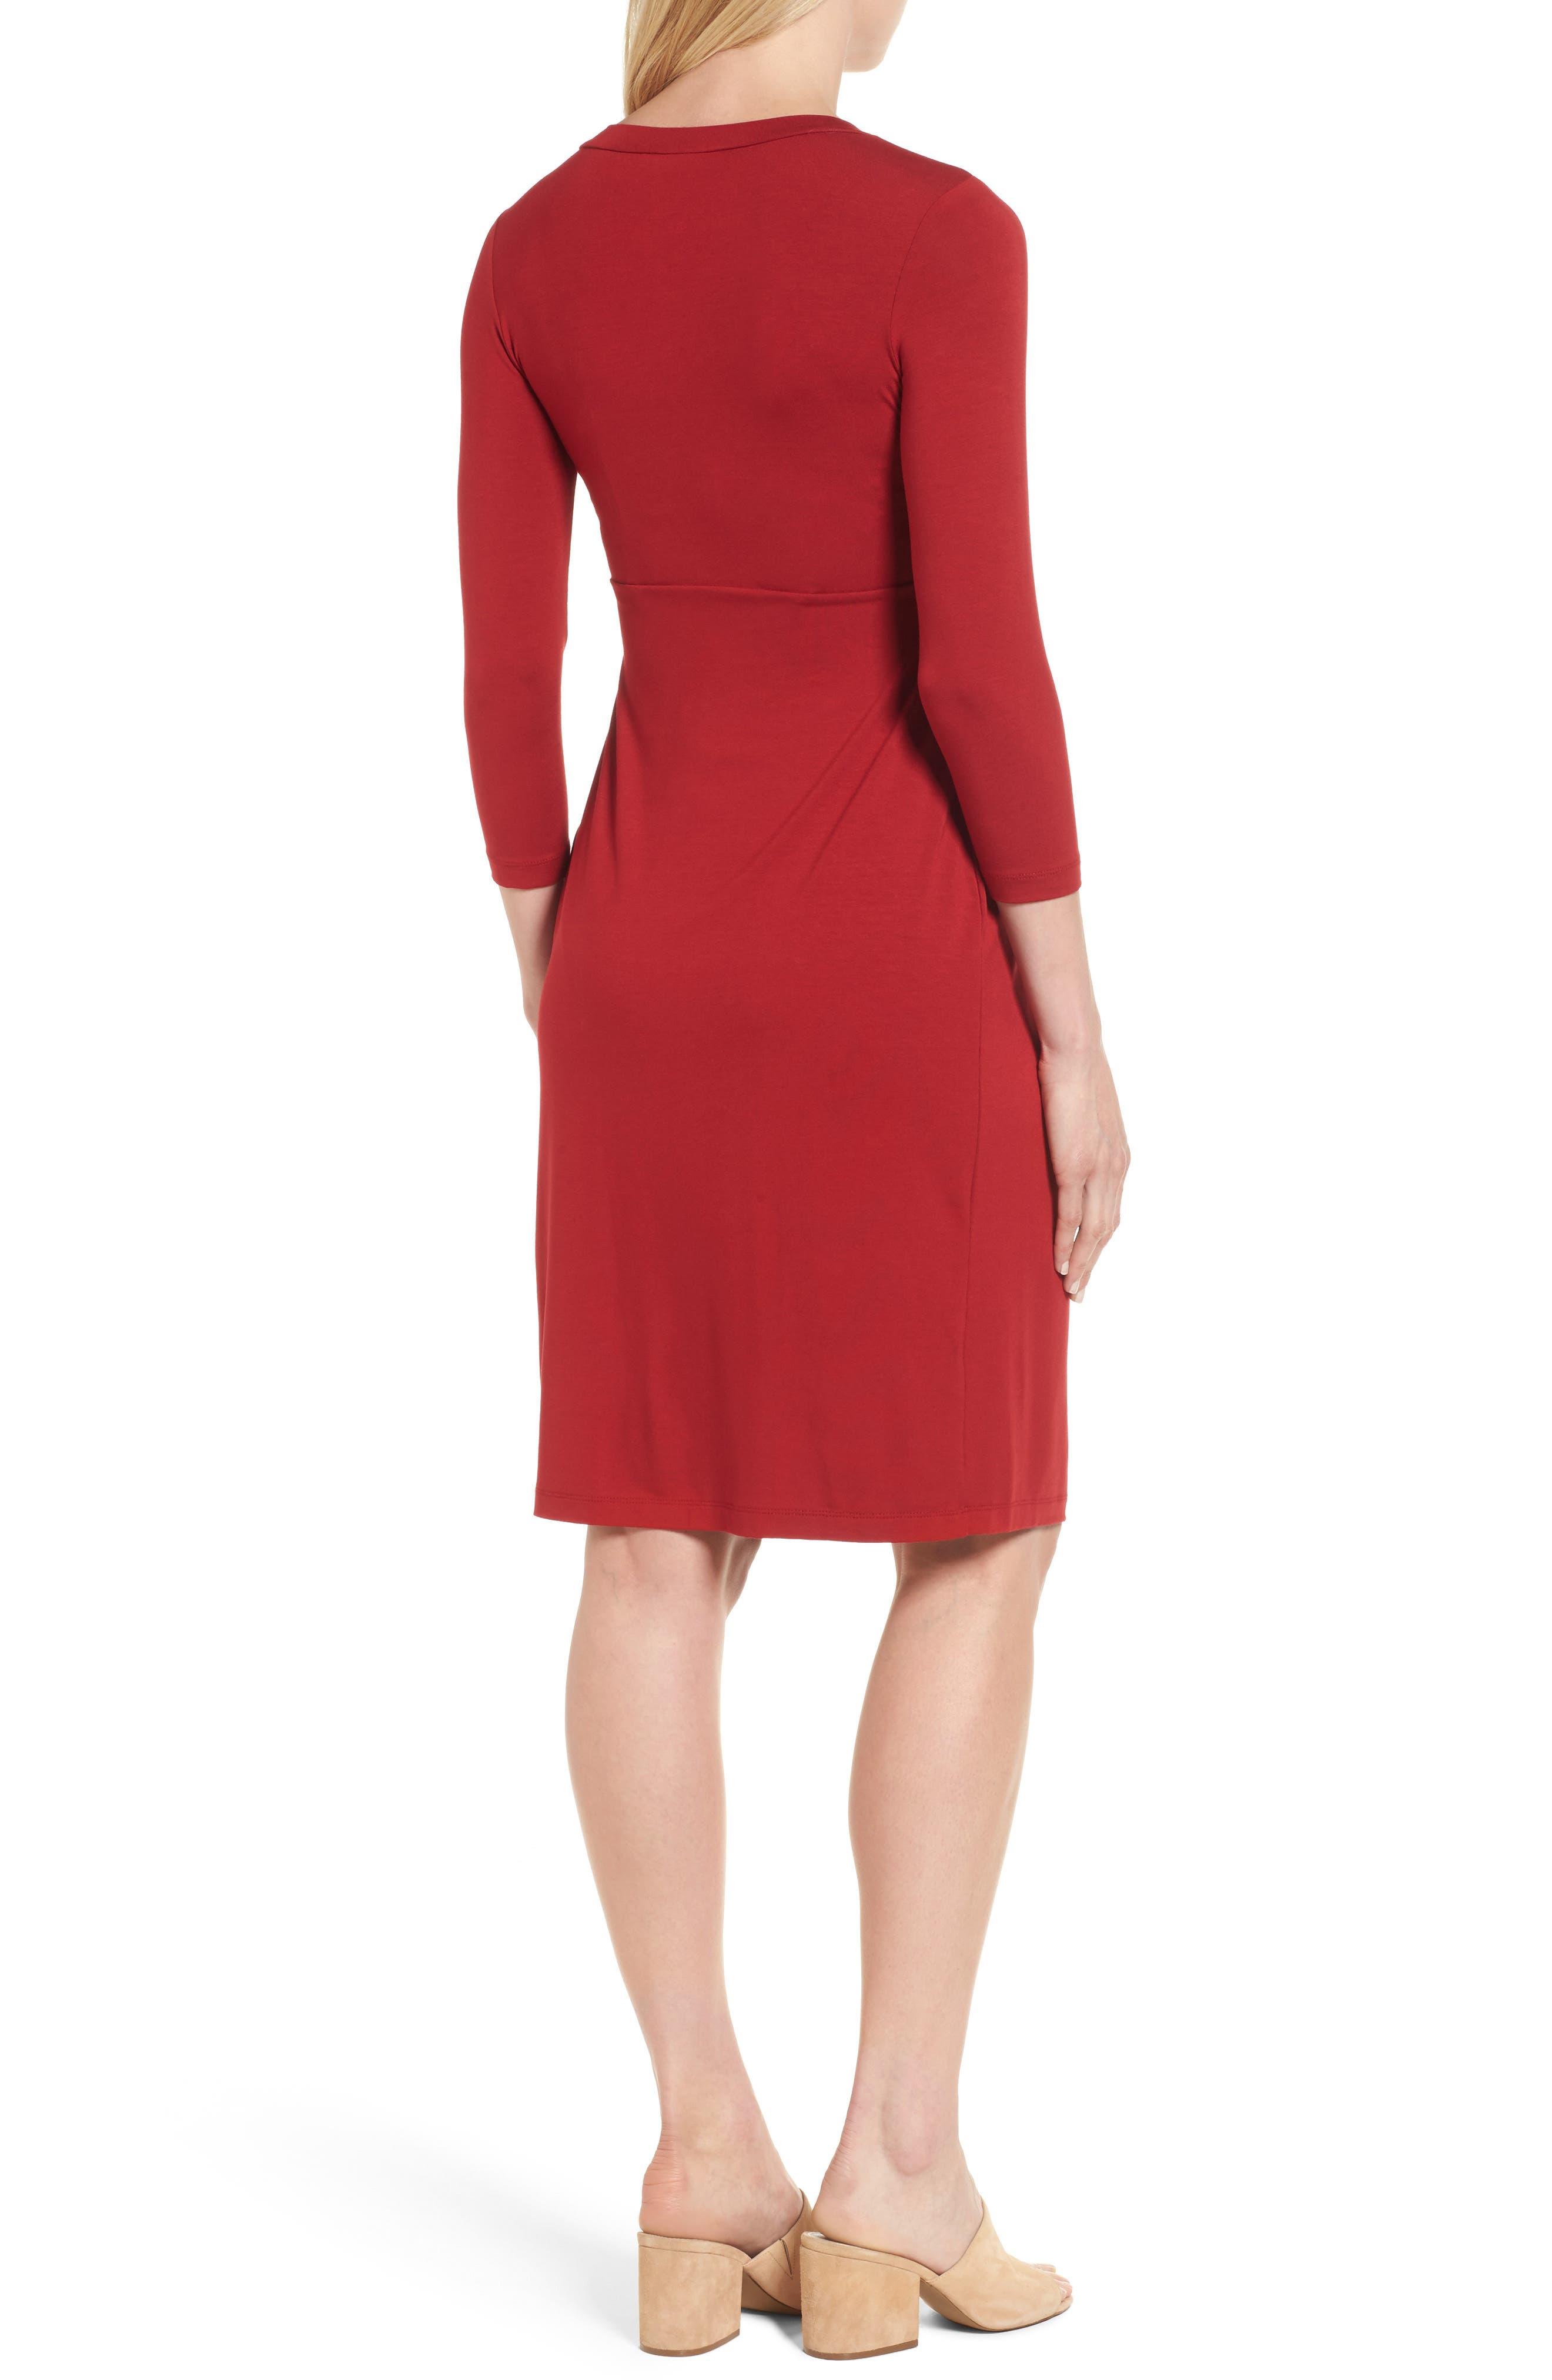 ISABELLA OLIVER,                             Gracia Surplice Maternity Dress,                             Alternate thumbnail 2, color,                             CARDAMOM RED